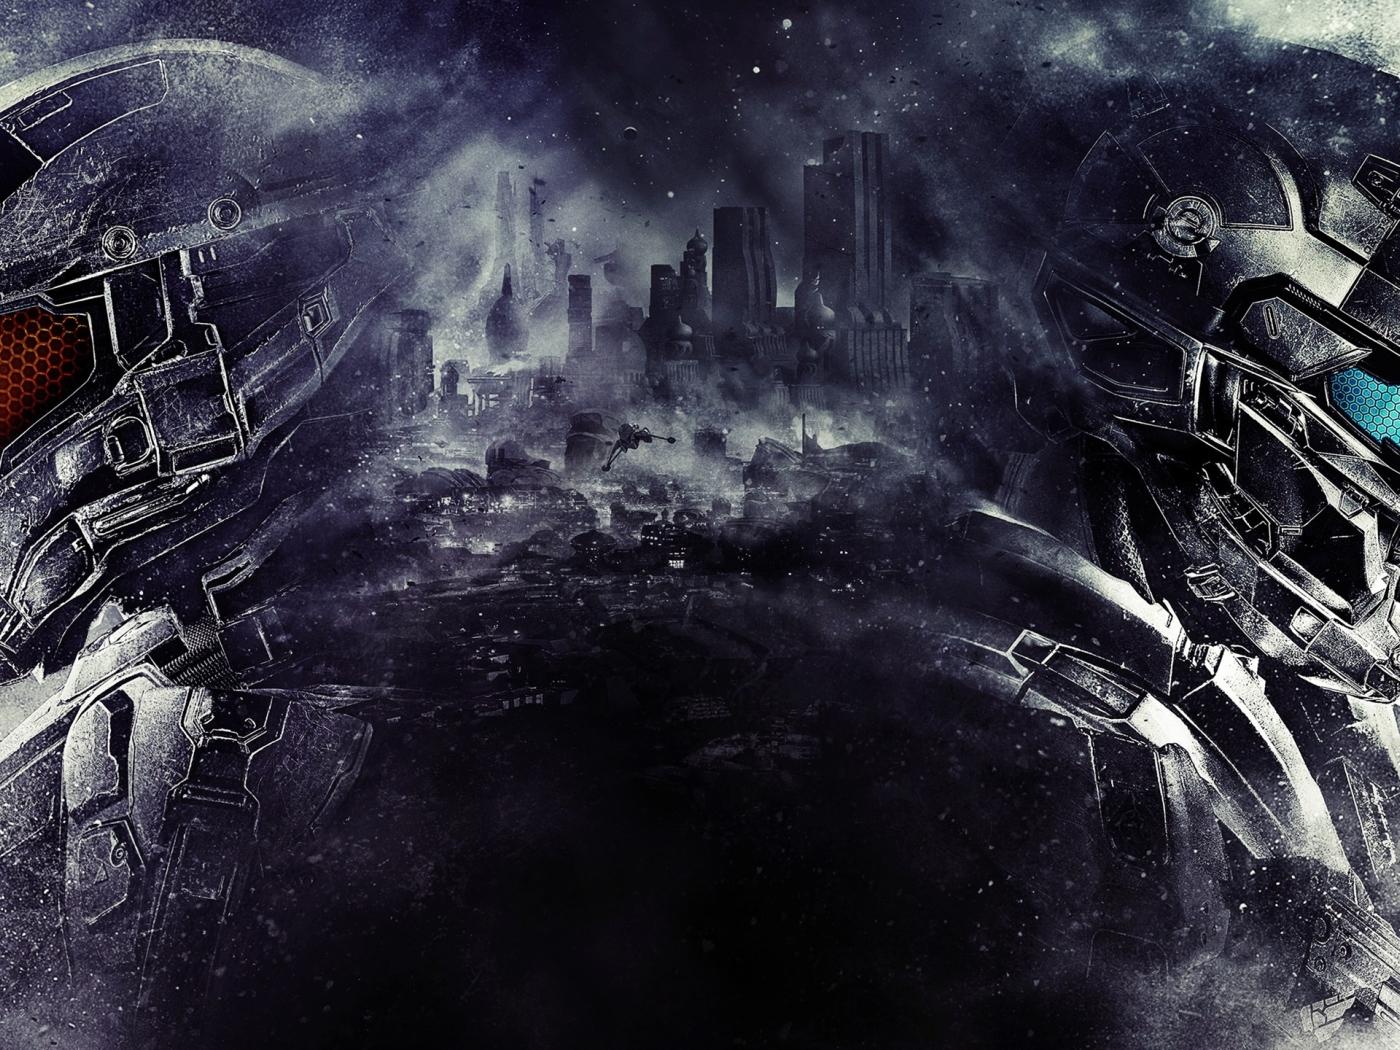 Halo 5 Guardians Wallpaper: Halo 5 Guardians, HD 4K Wallpaper